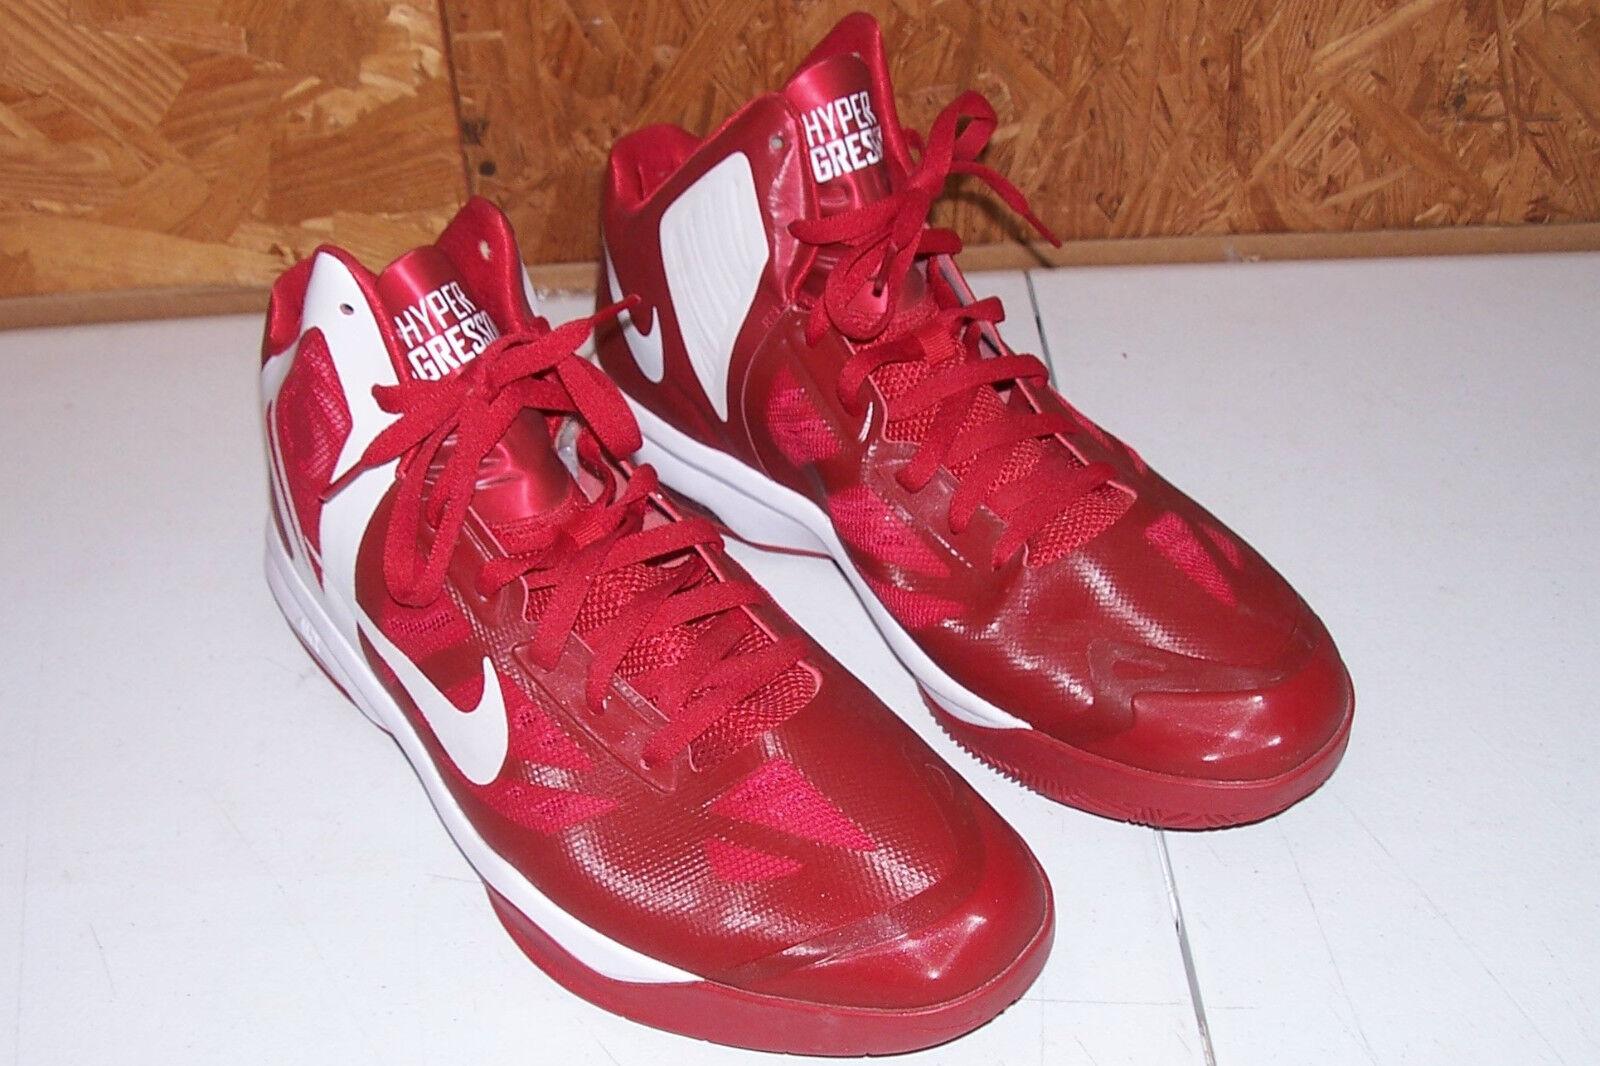 Größe 14 Nike Air Max Hyper Aggressor Basketball schuhe Men's rot Athletic Running